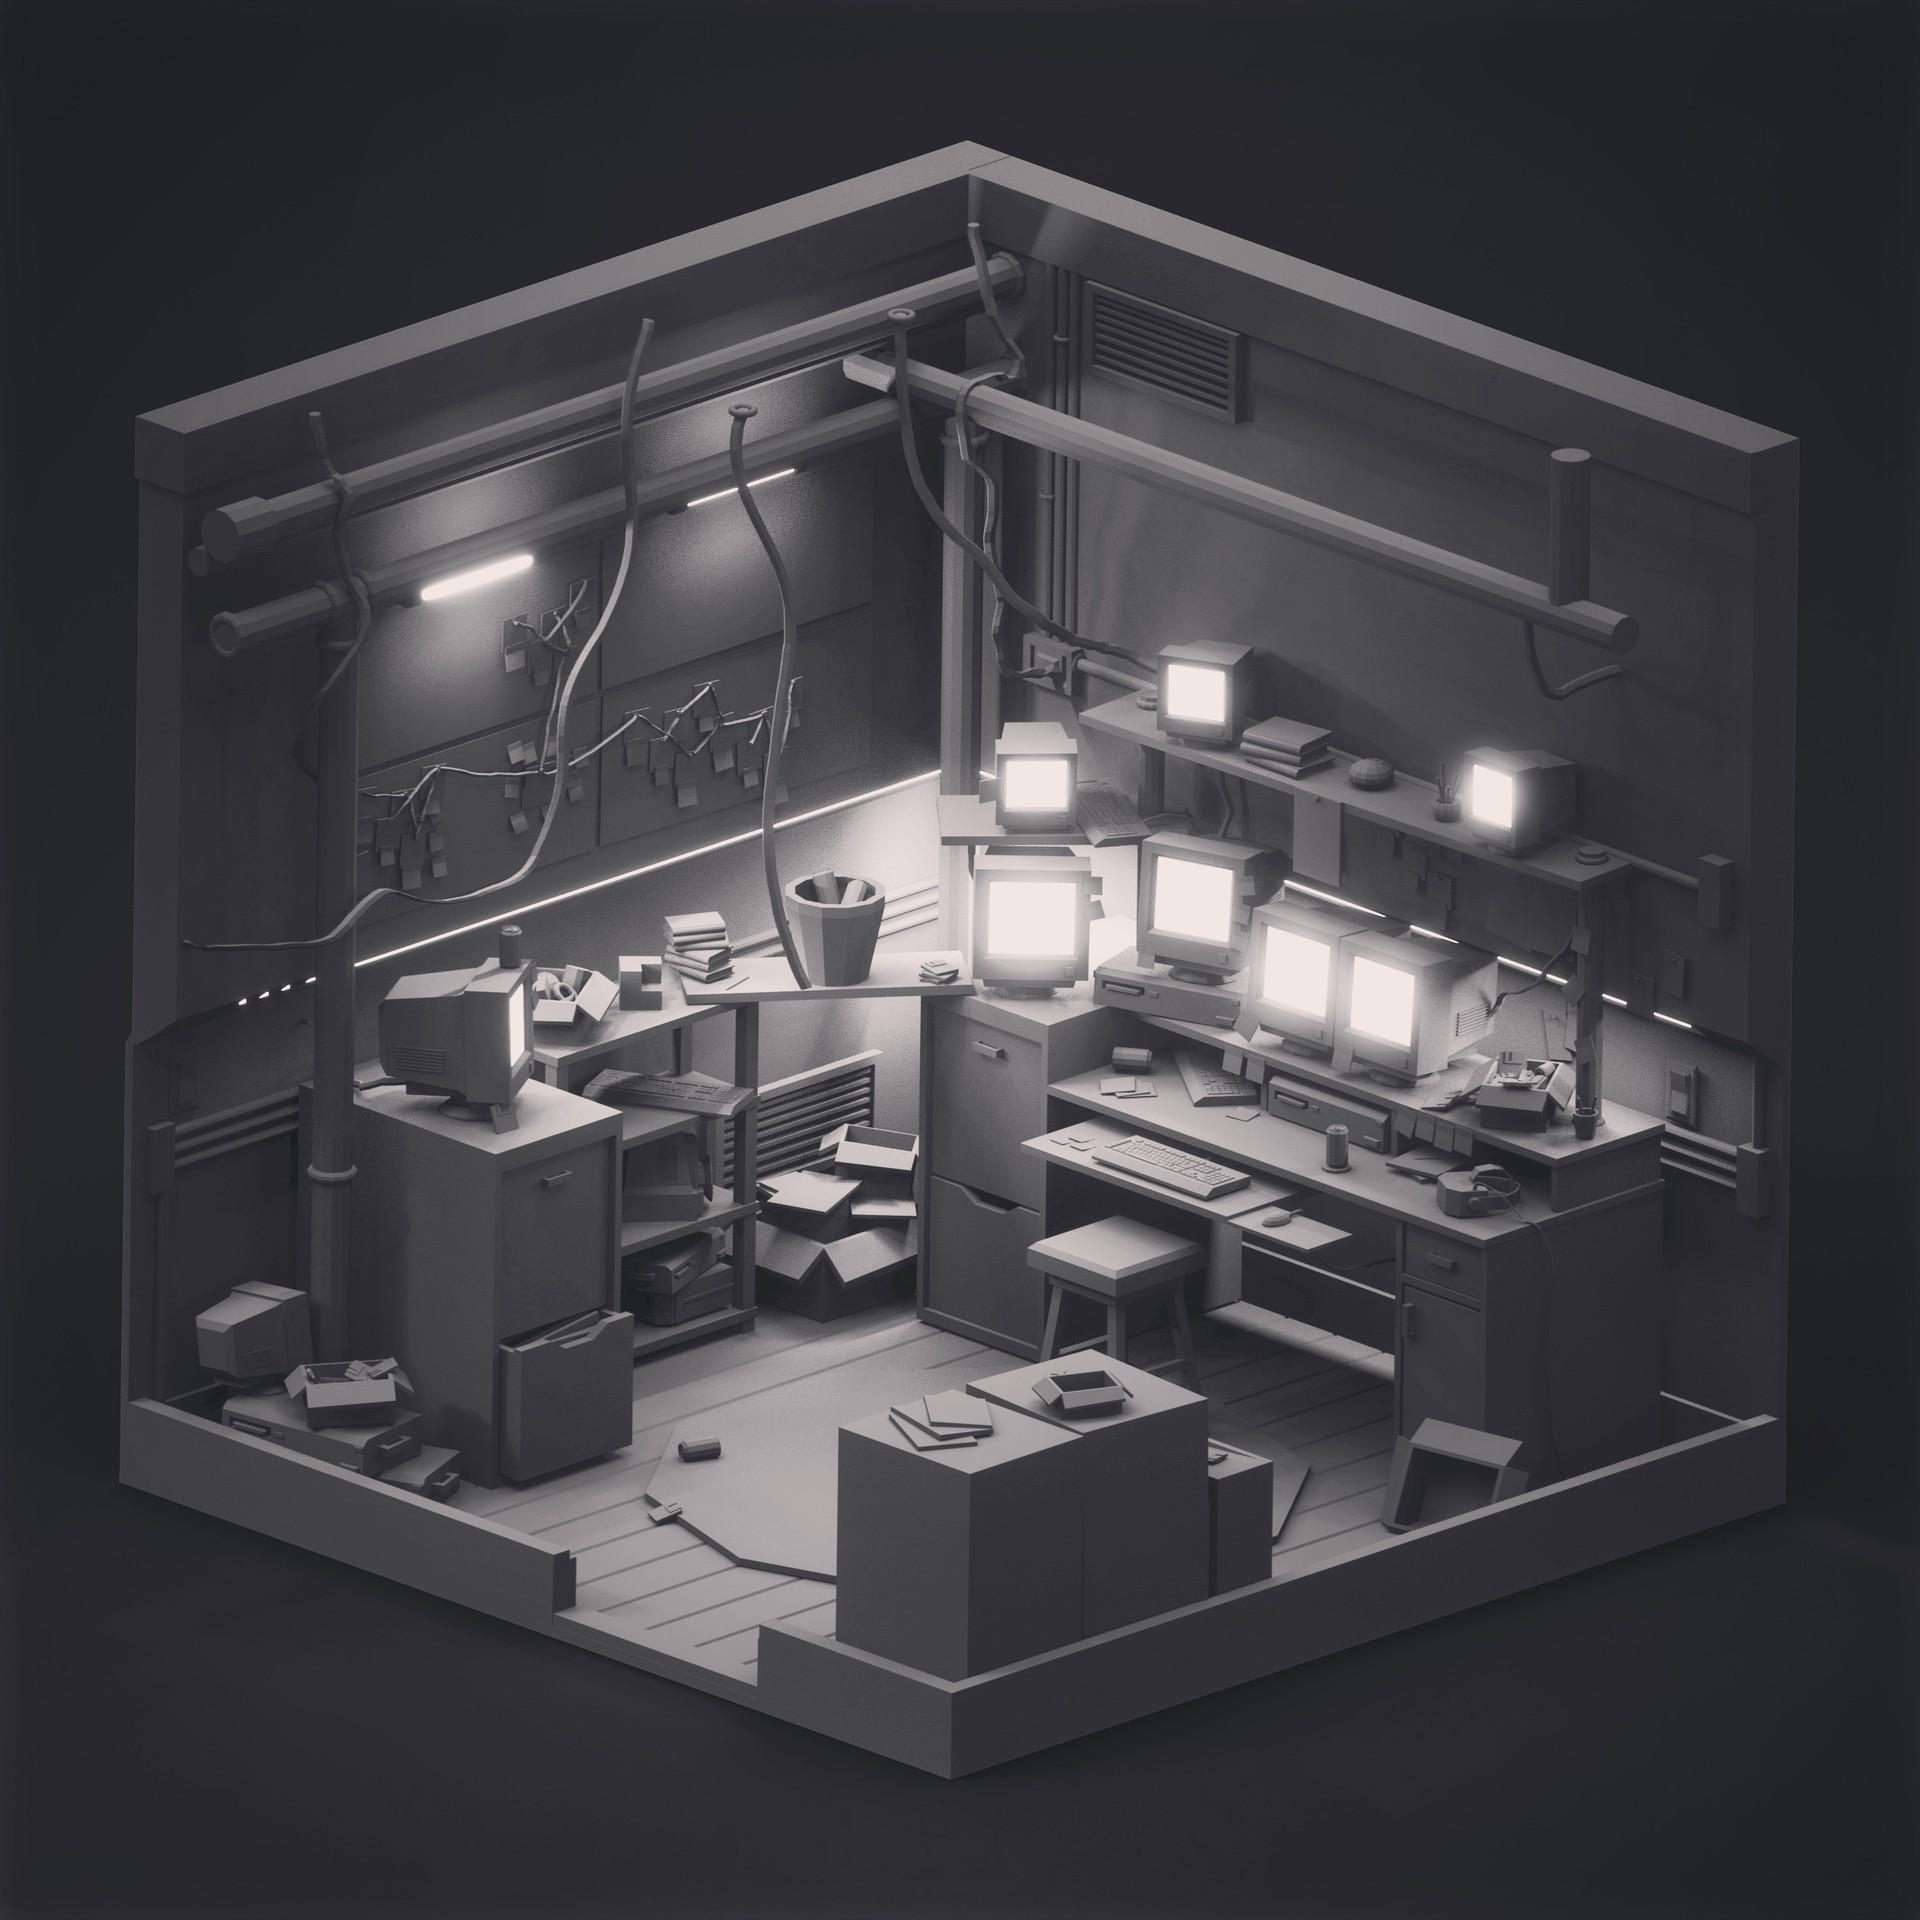 Jarlan perez lab02 bw